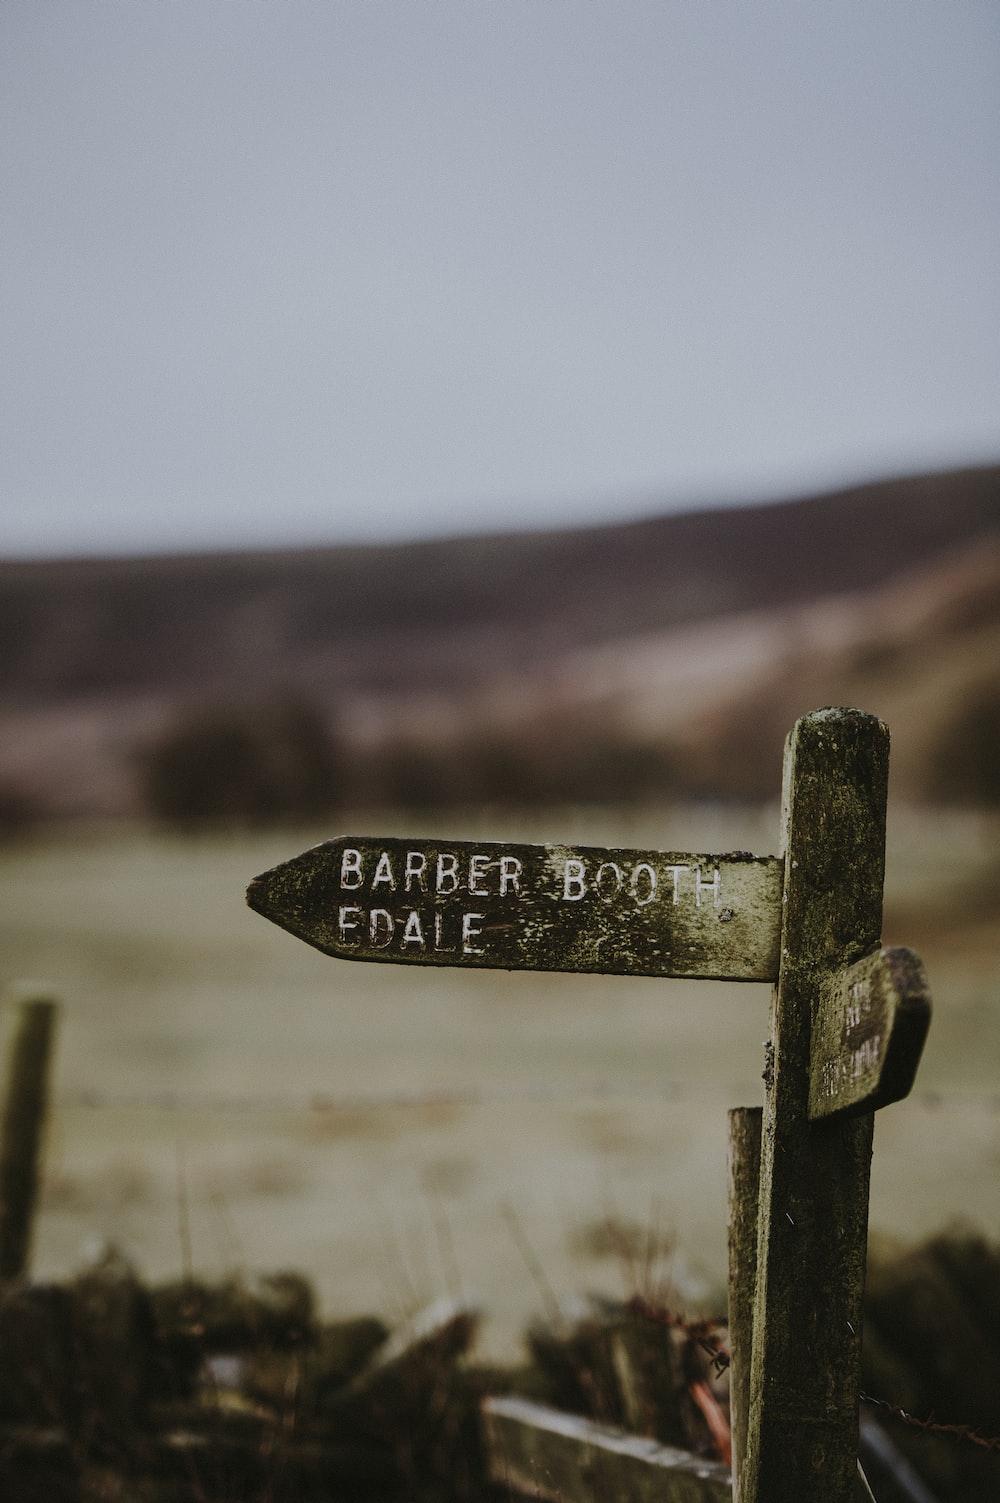 macro shot of black wooden Barber Booth Edale signage